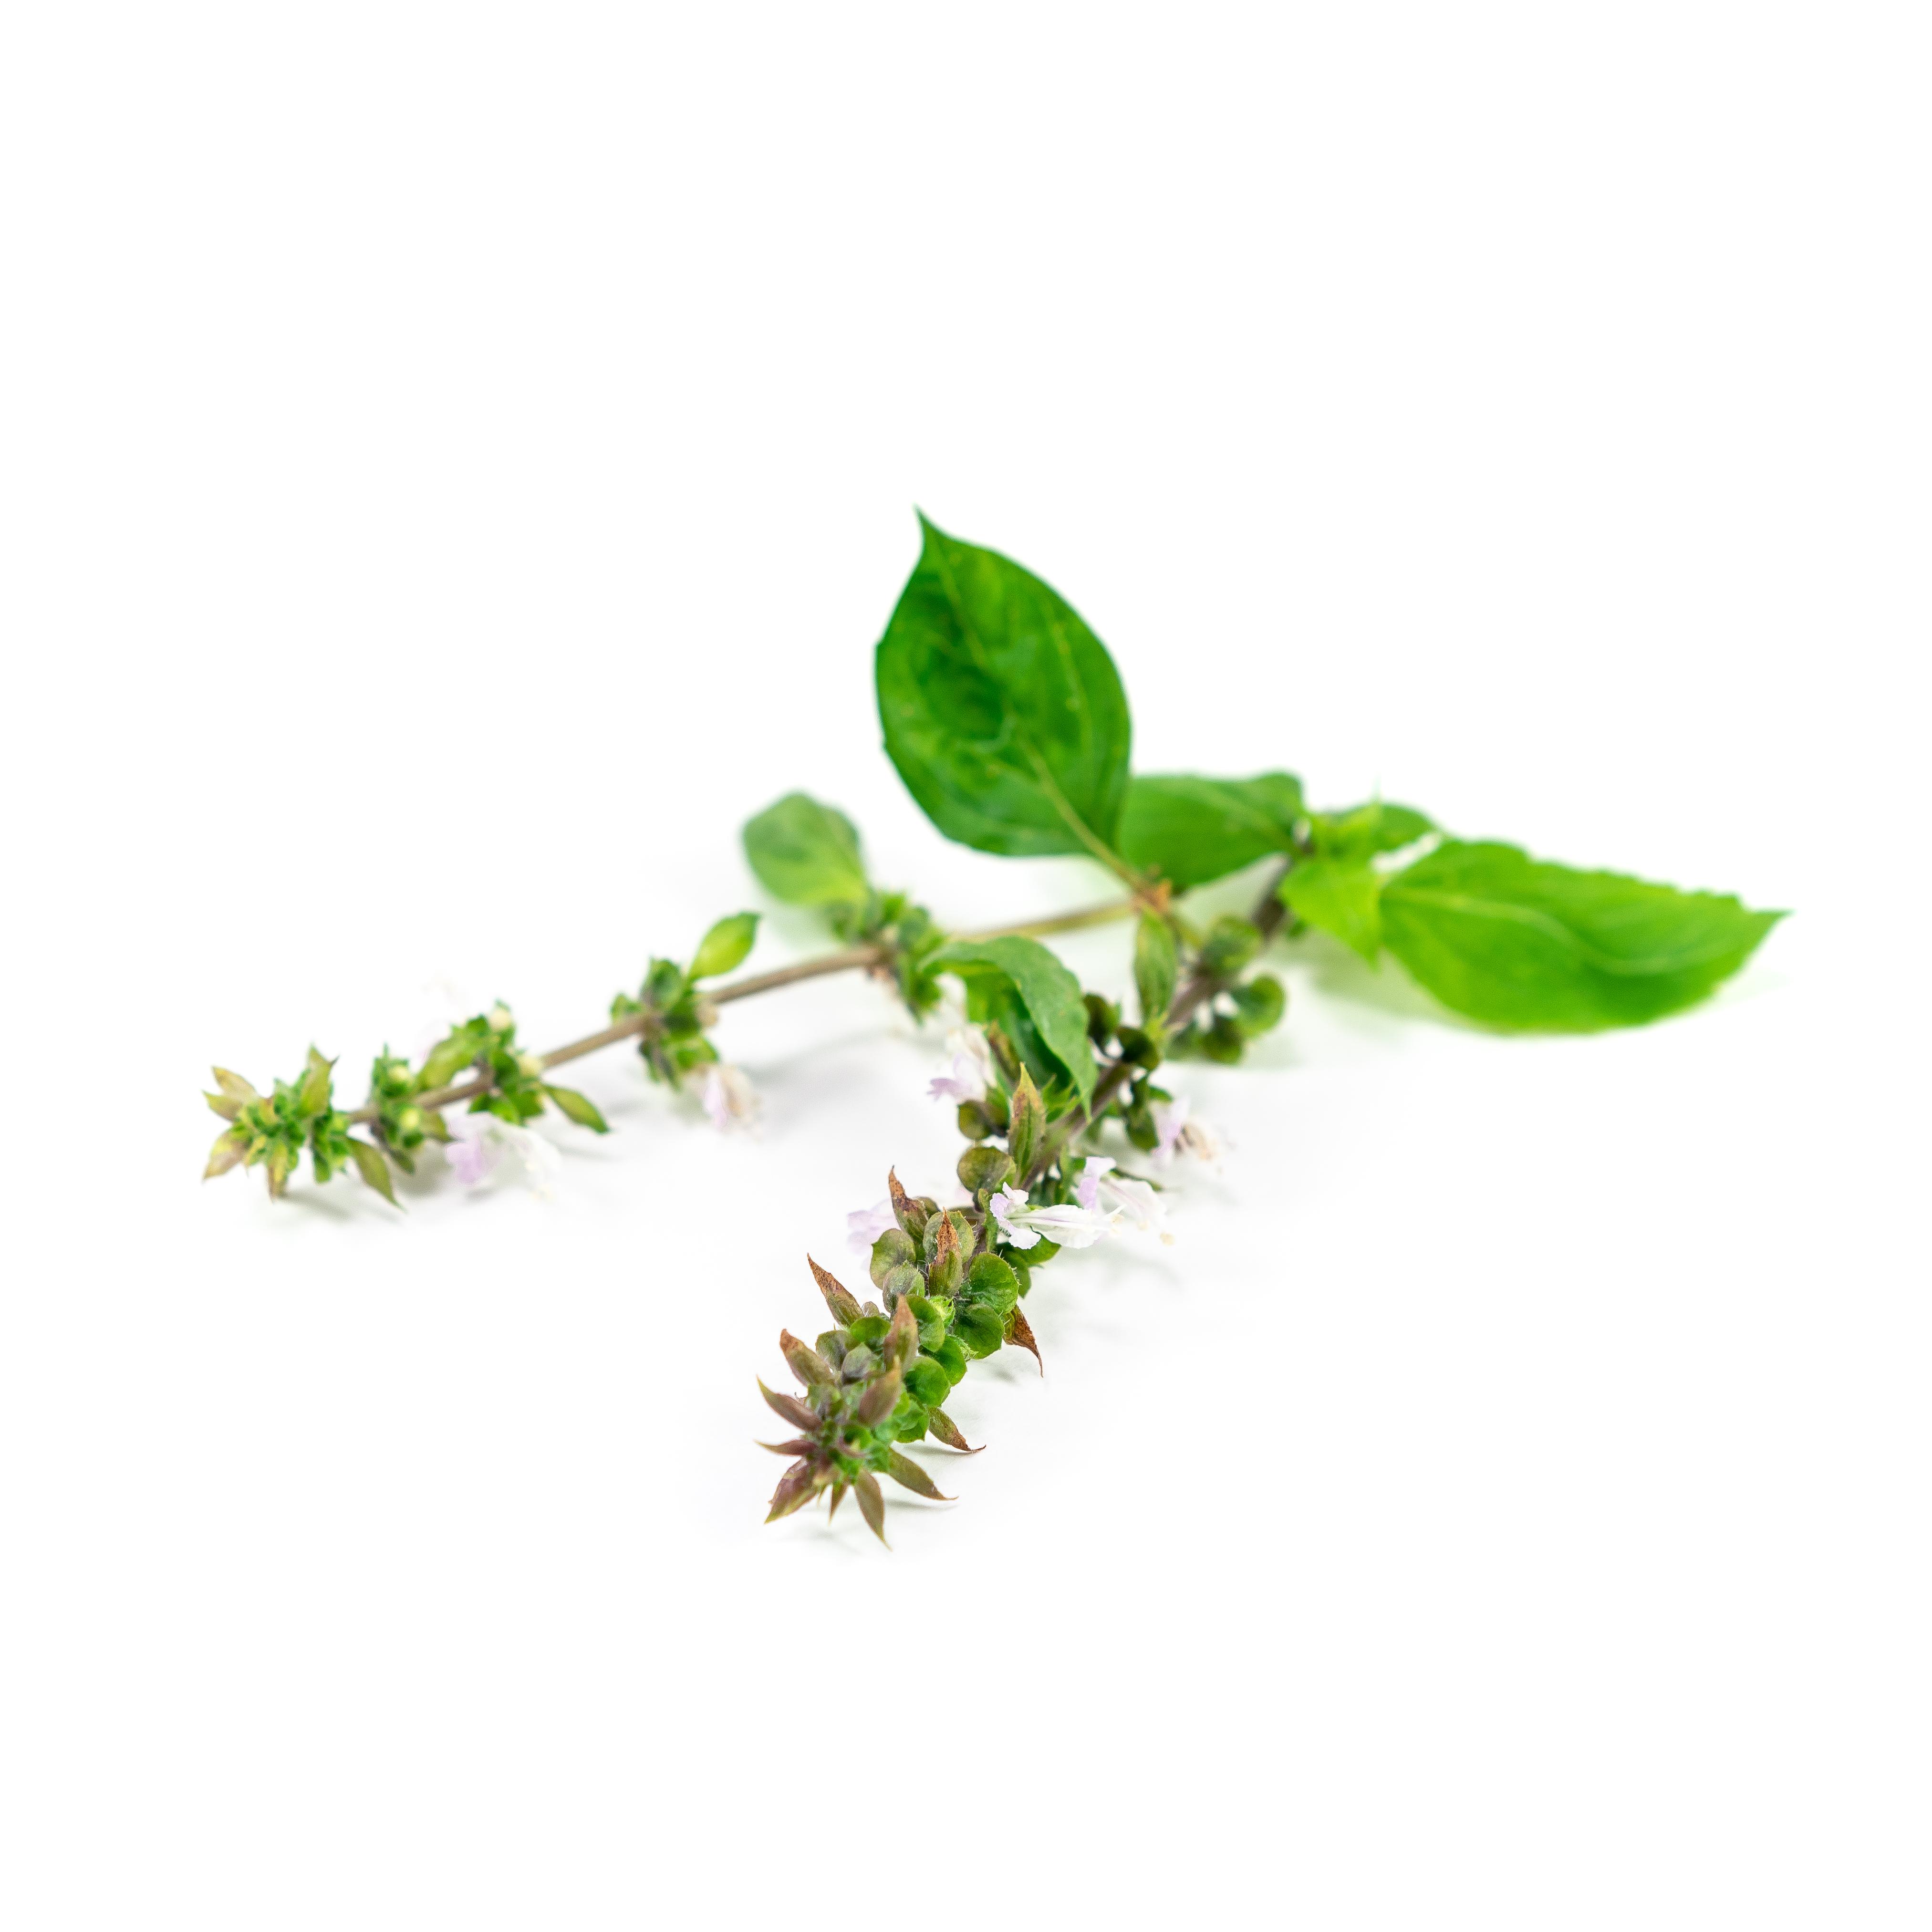 Basil (Cinnamon) Flowering Stem